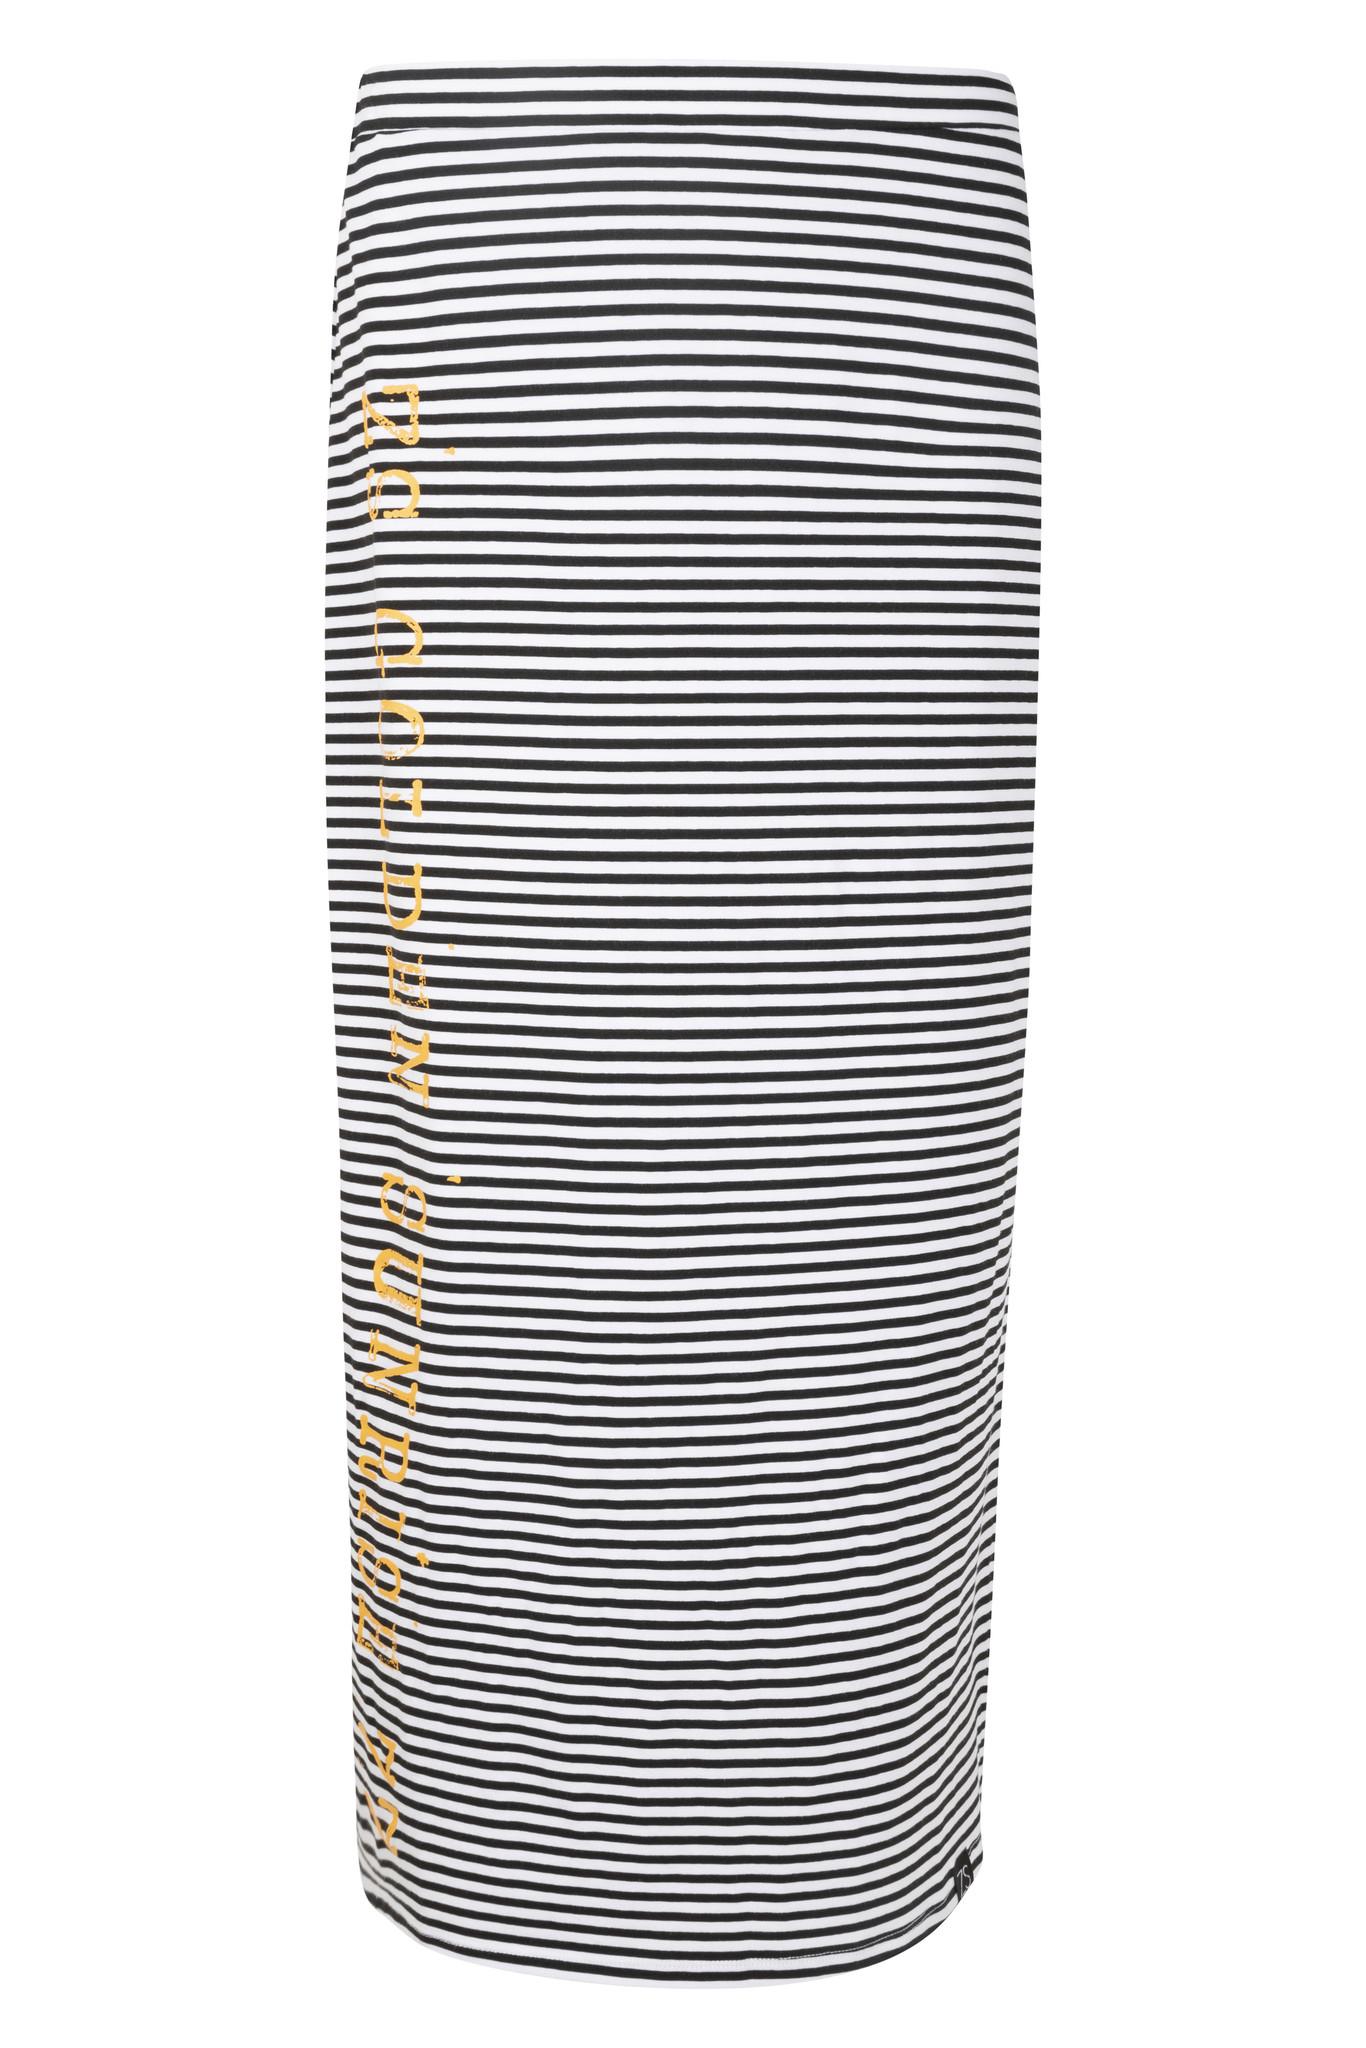 Zoso Zoso Jill rok striped with print summergold